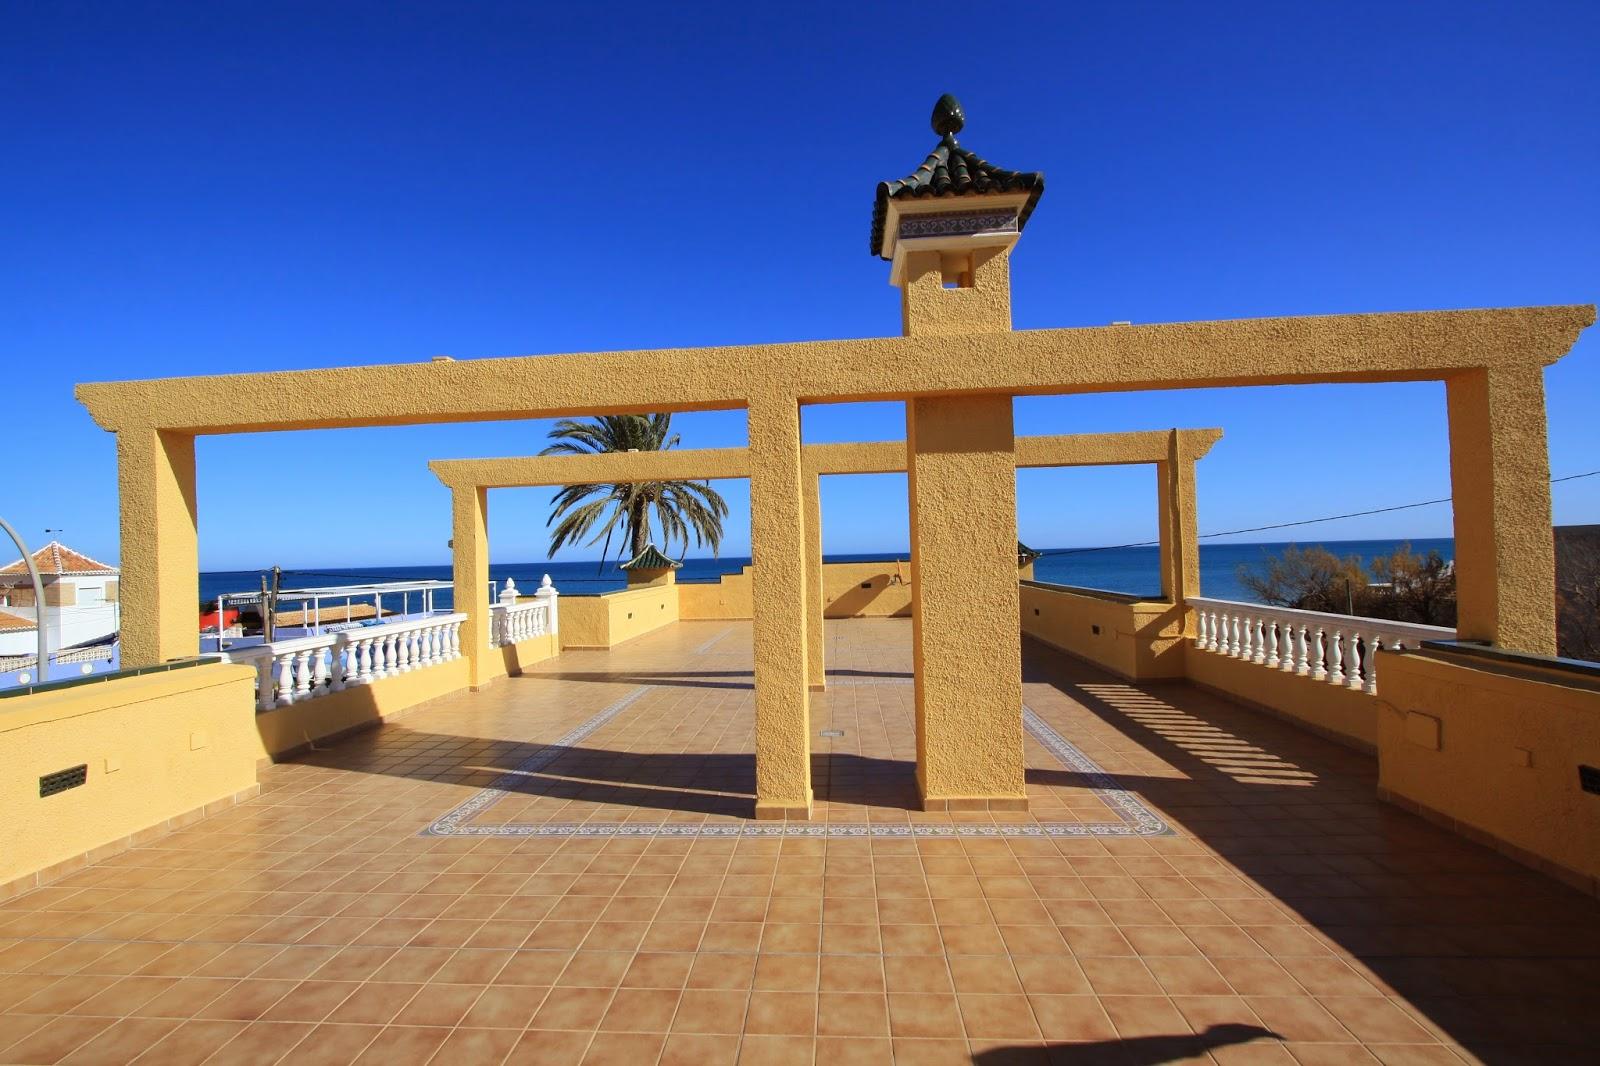 chalet de lujo en denia primera linea de la playa